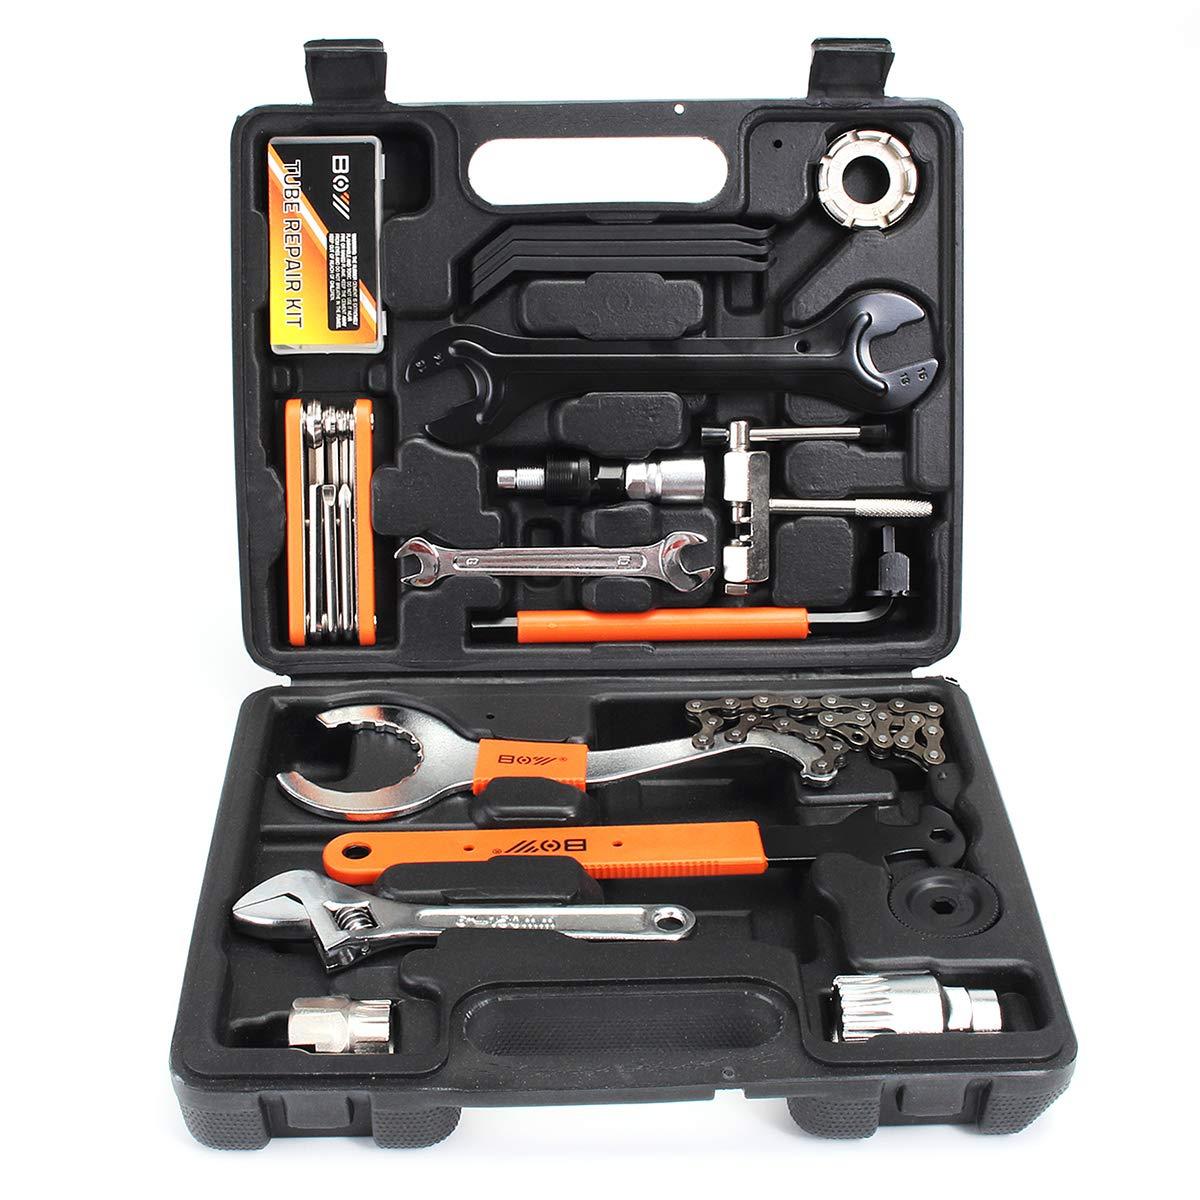 OlogyMart Bikehut Bike Bicycle Cycle Complete Maintenance Hand Repair Tools Kit Set With Box